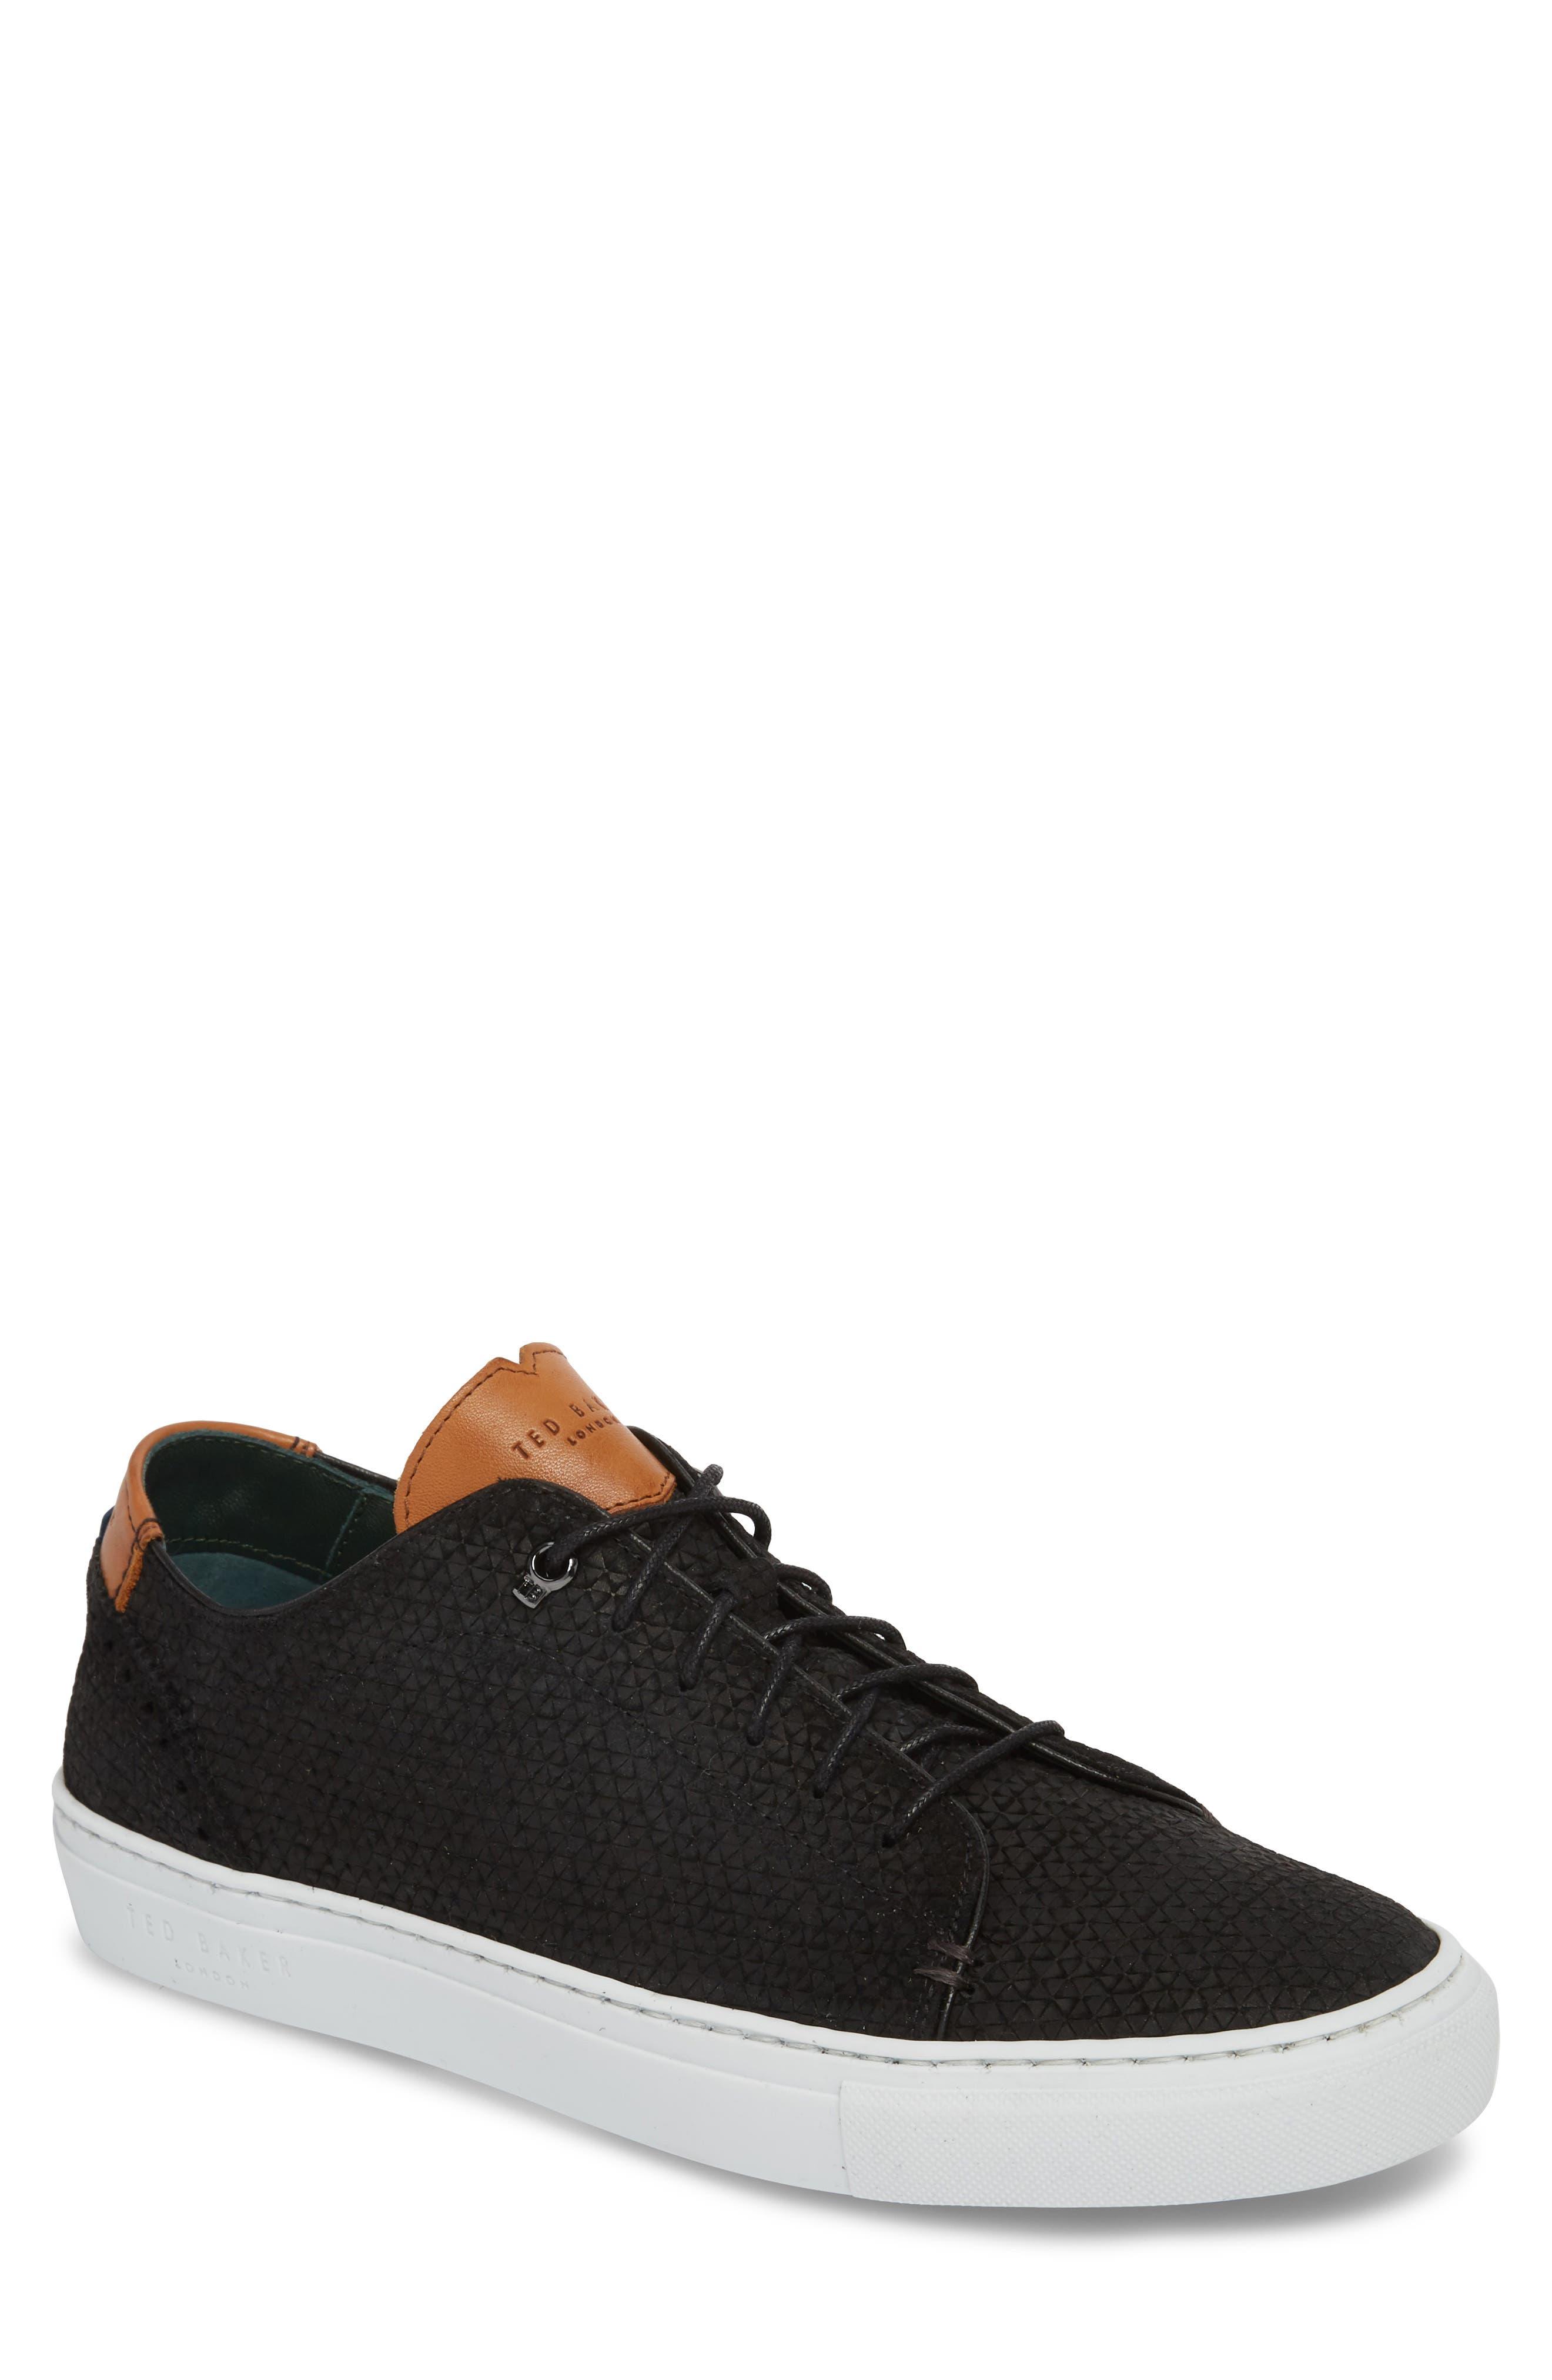 TED BAKER LONDON,                             Duukes Embossed Low Top Sneaker,                             Main thumbnail 1, color,                             010